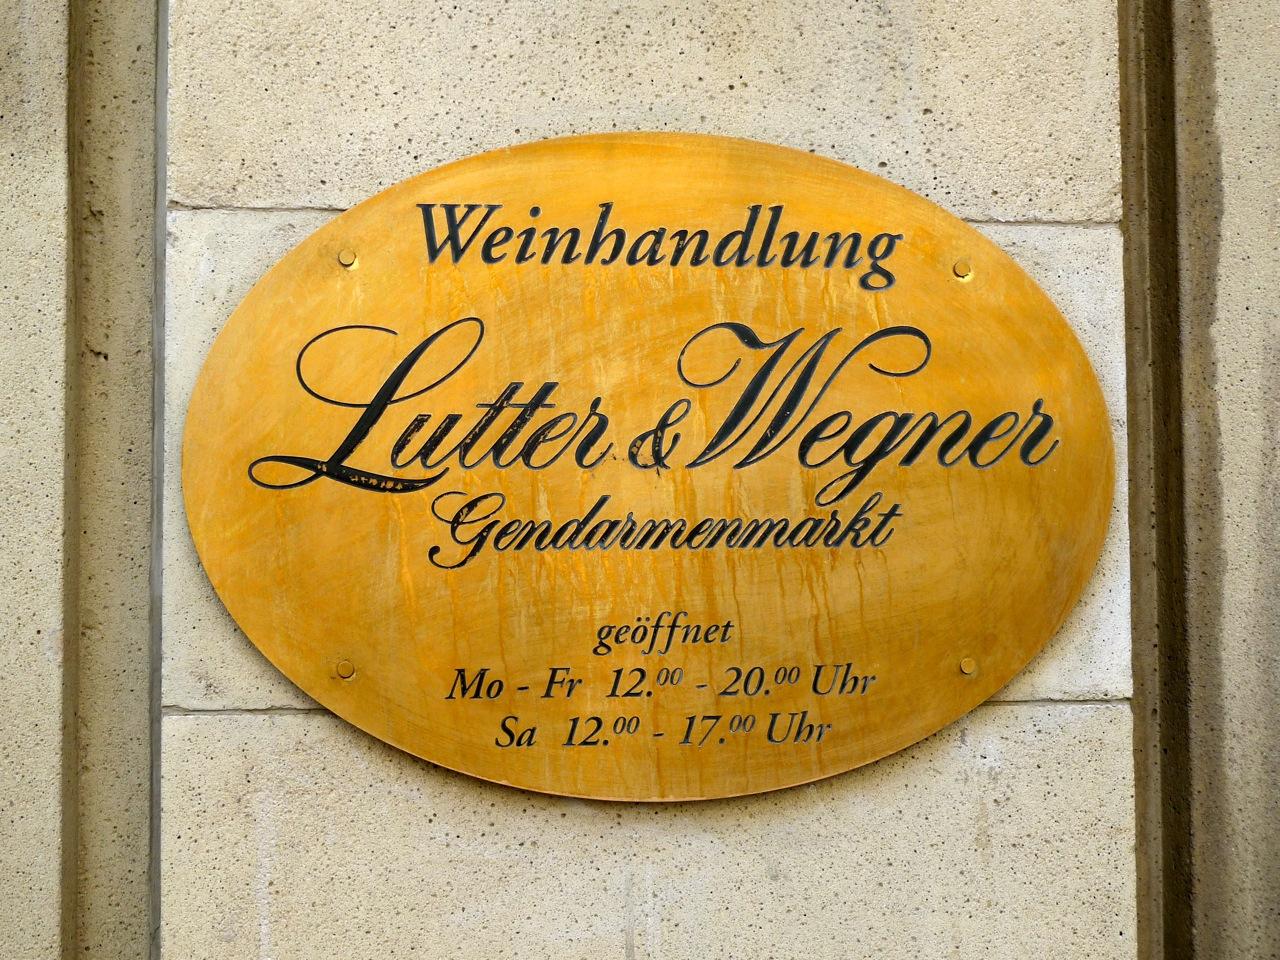 Onde comer em Berlim?-Lutter & Wegner